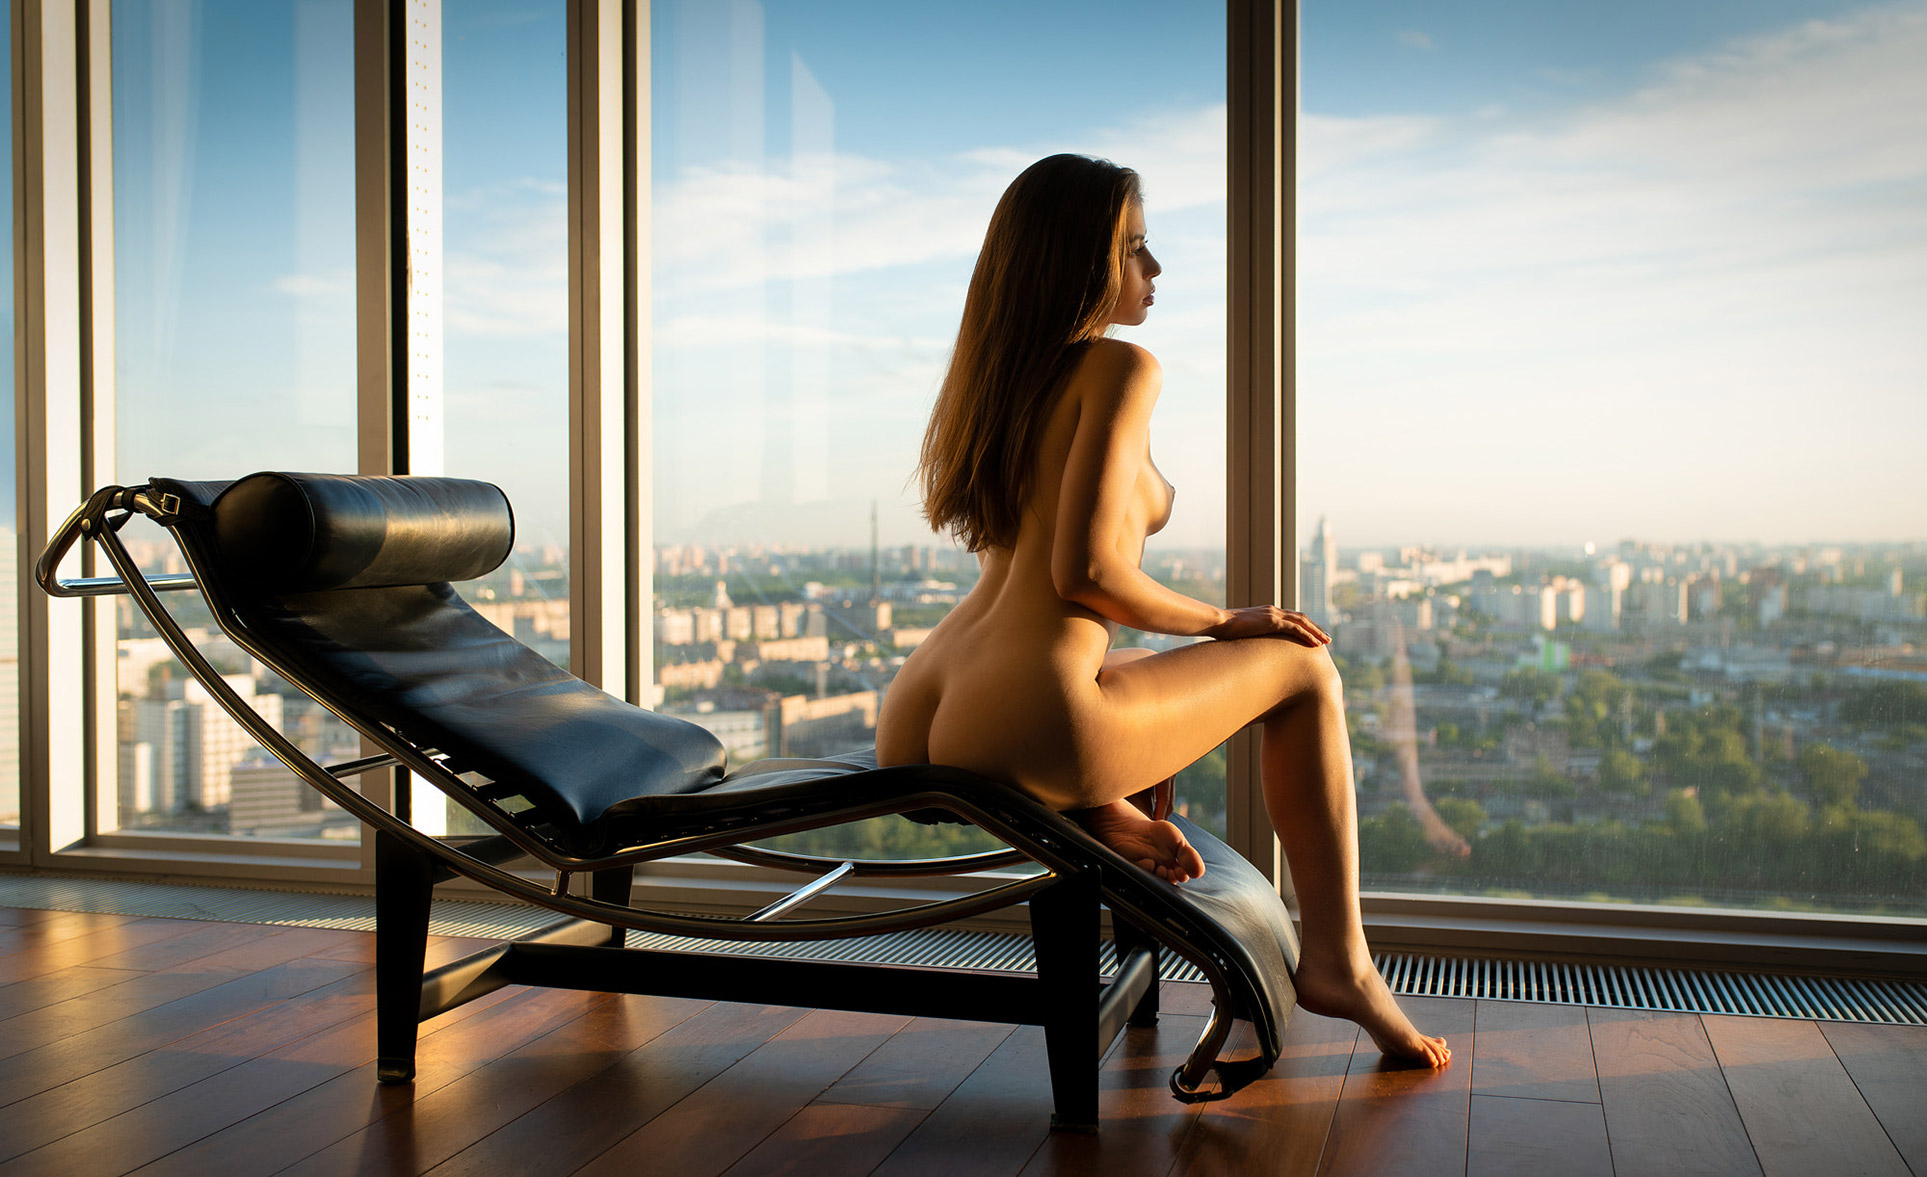 Виктория Алико наблюдает за закатом в городе из окна небоскреба / Sunset in the City - Viktoriia Aliko by Vladimir Nikolaev